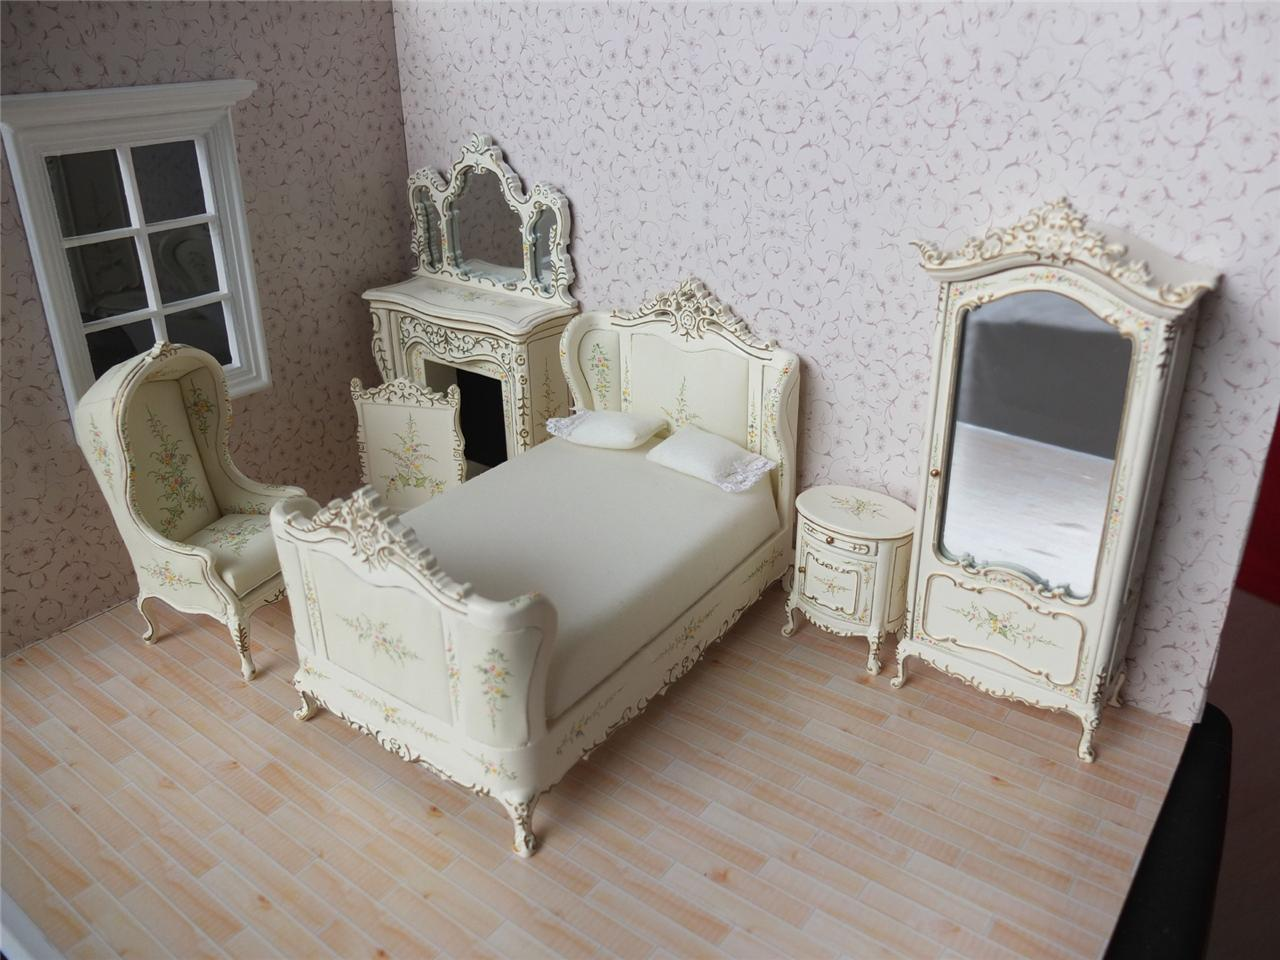 bedroom chair on ebay copa beach chairs target bespaq dollhouse miniature french furniture set